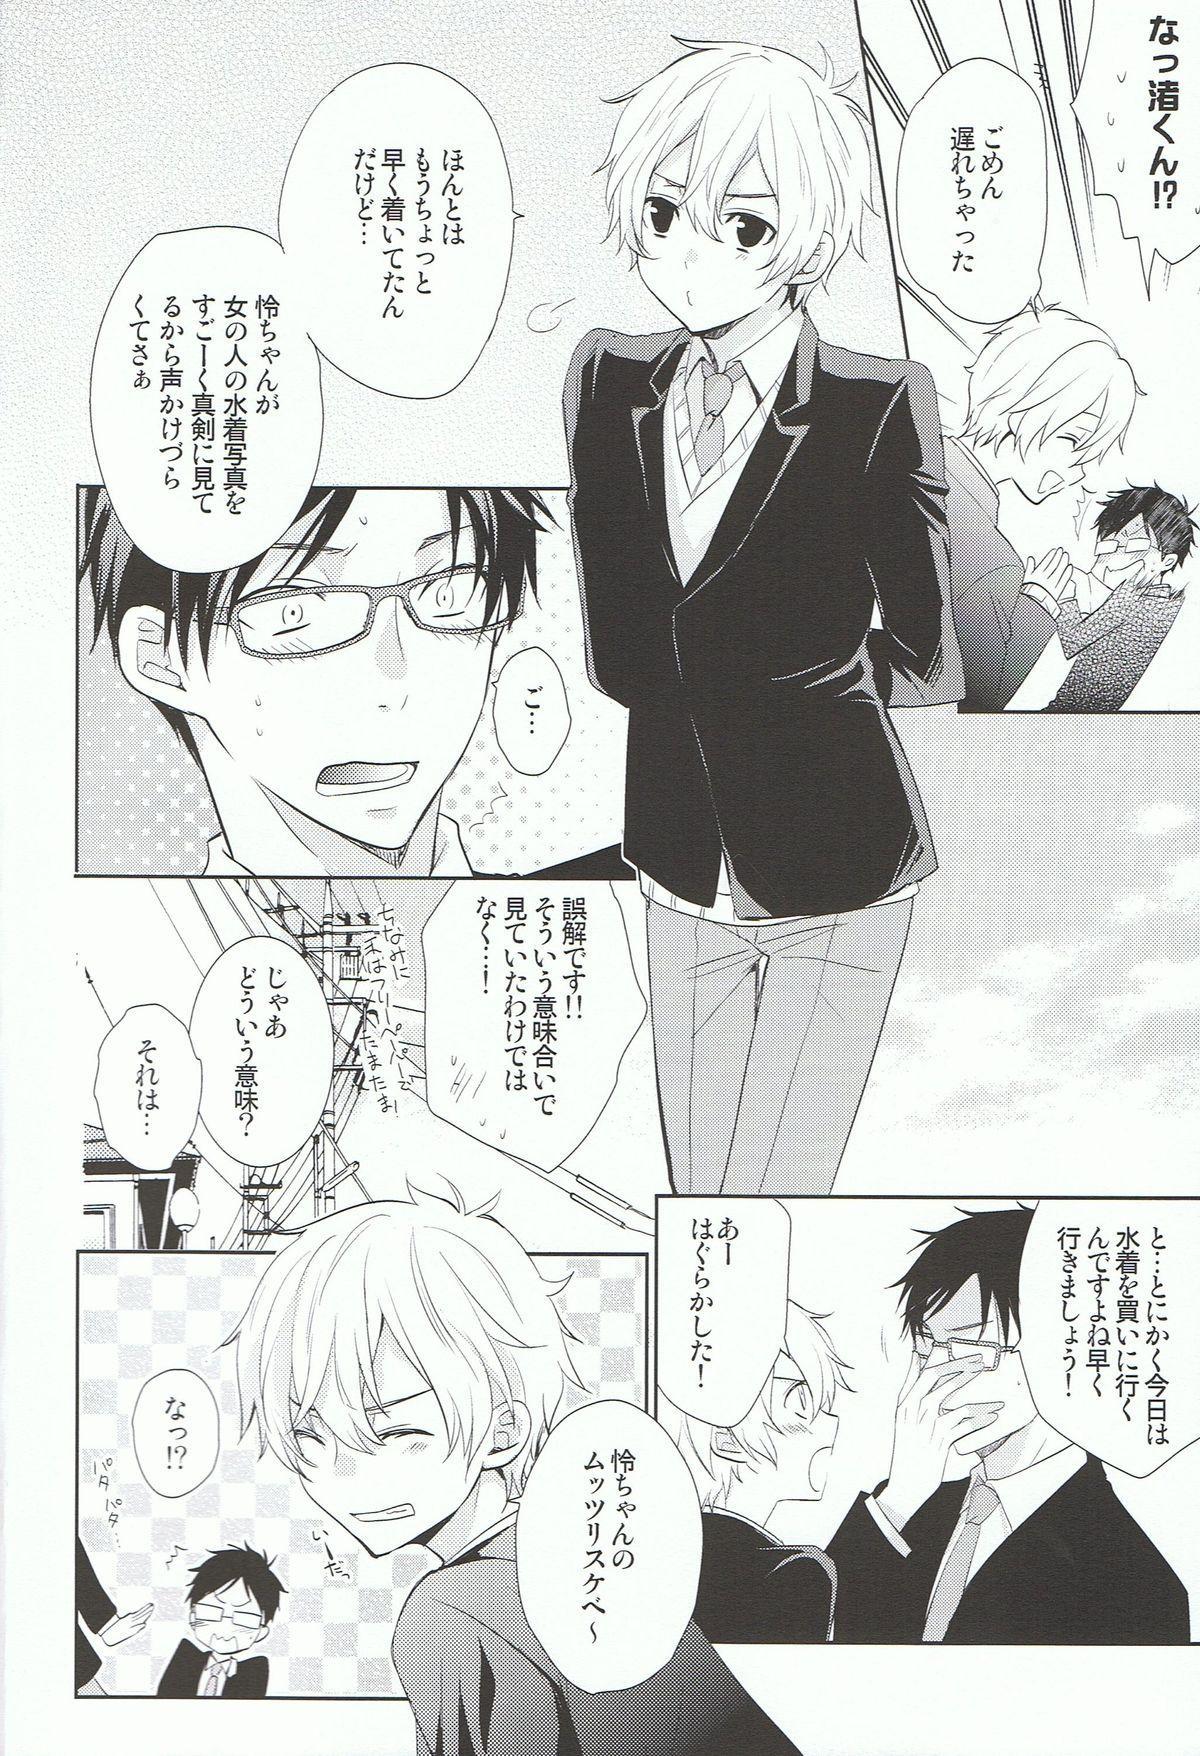 Nagisa-kun de ii deshou! 12